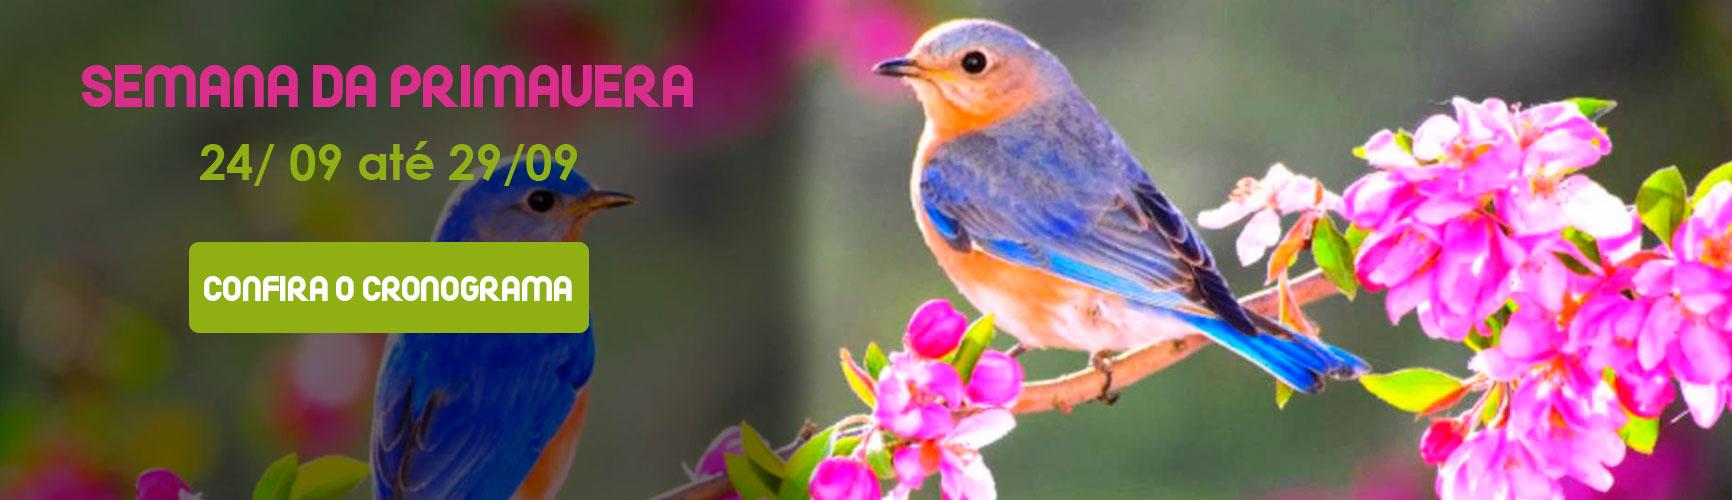 primavera-banner